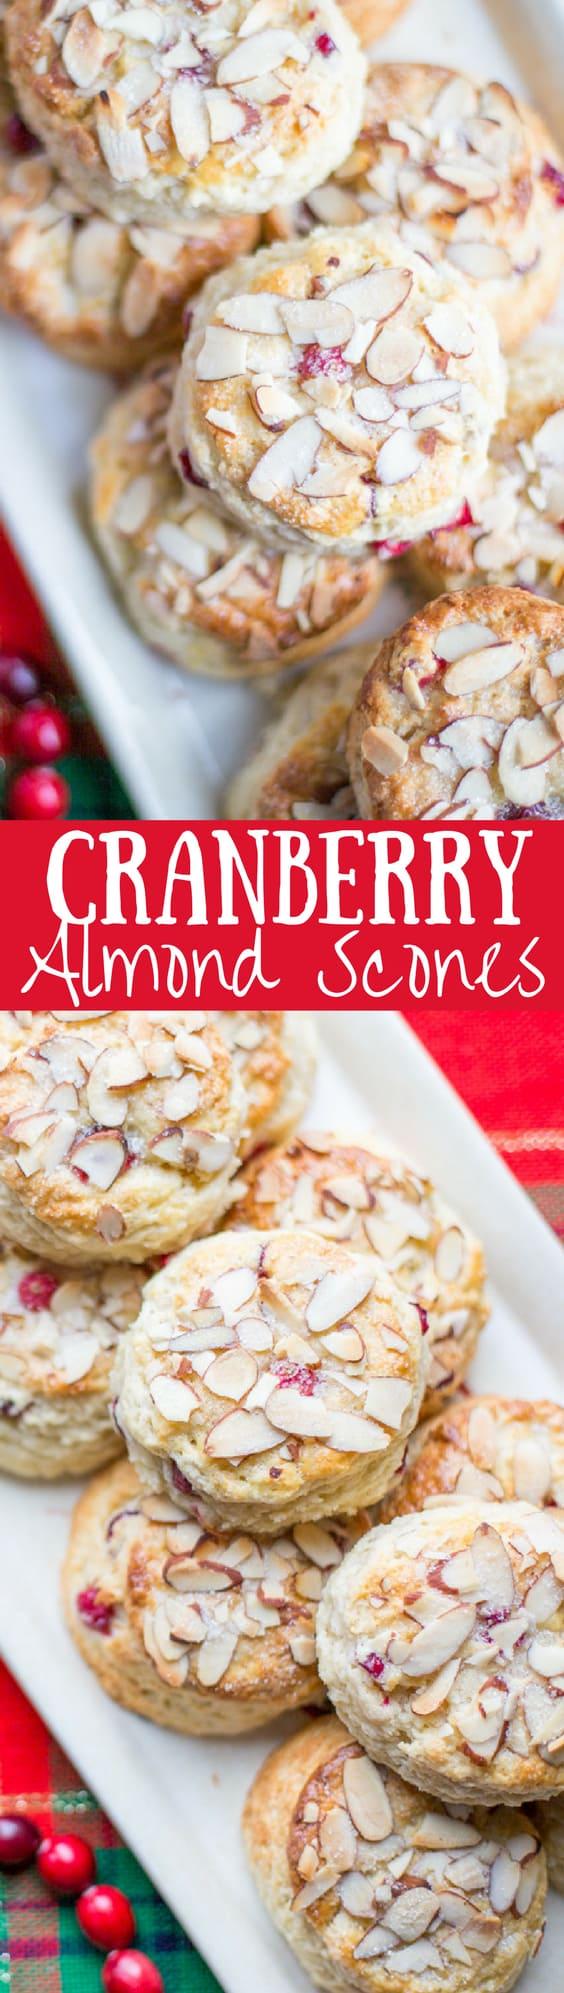 Cranberry Almond Scones - lightly sweet with a big almond flavor | www.savingdessert.com